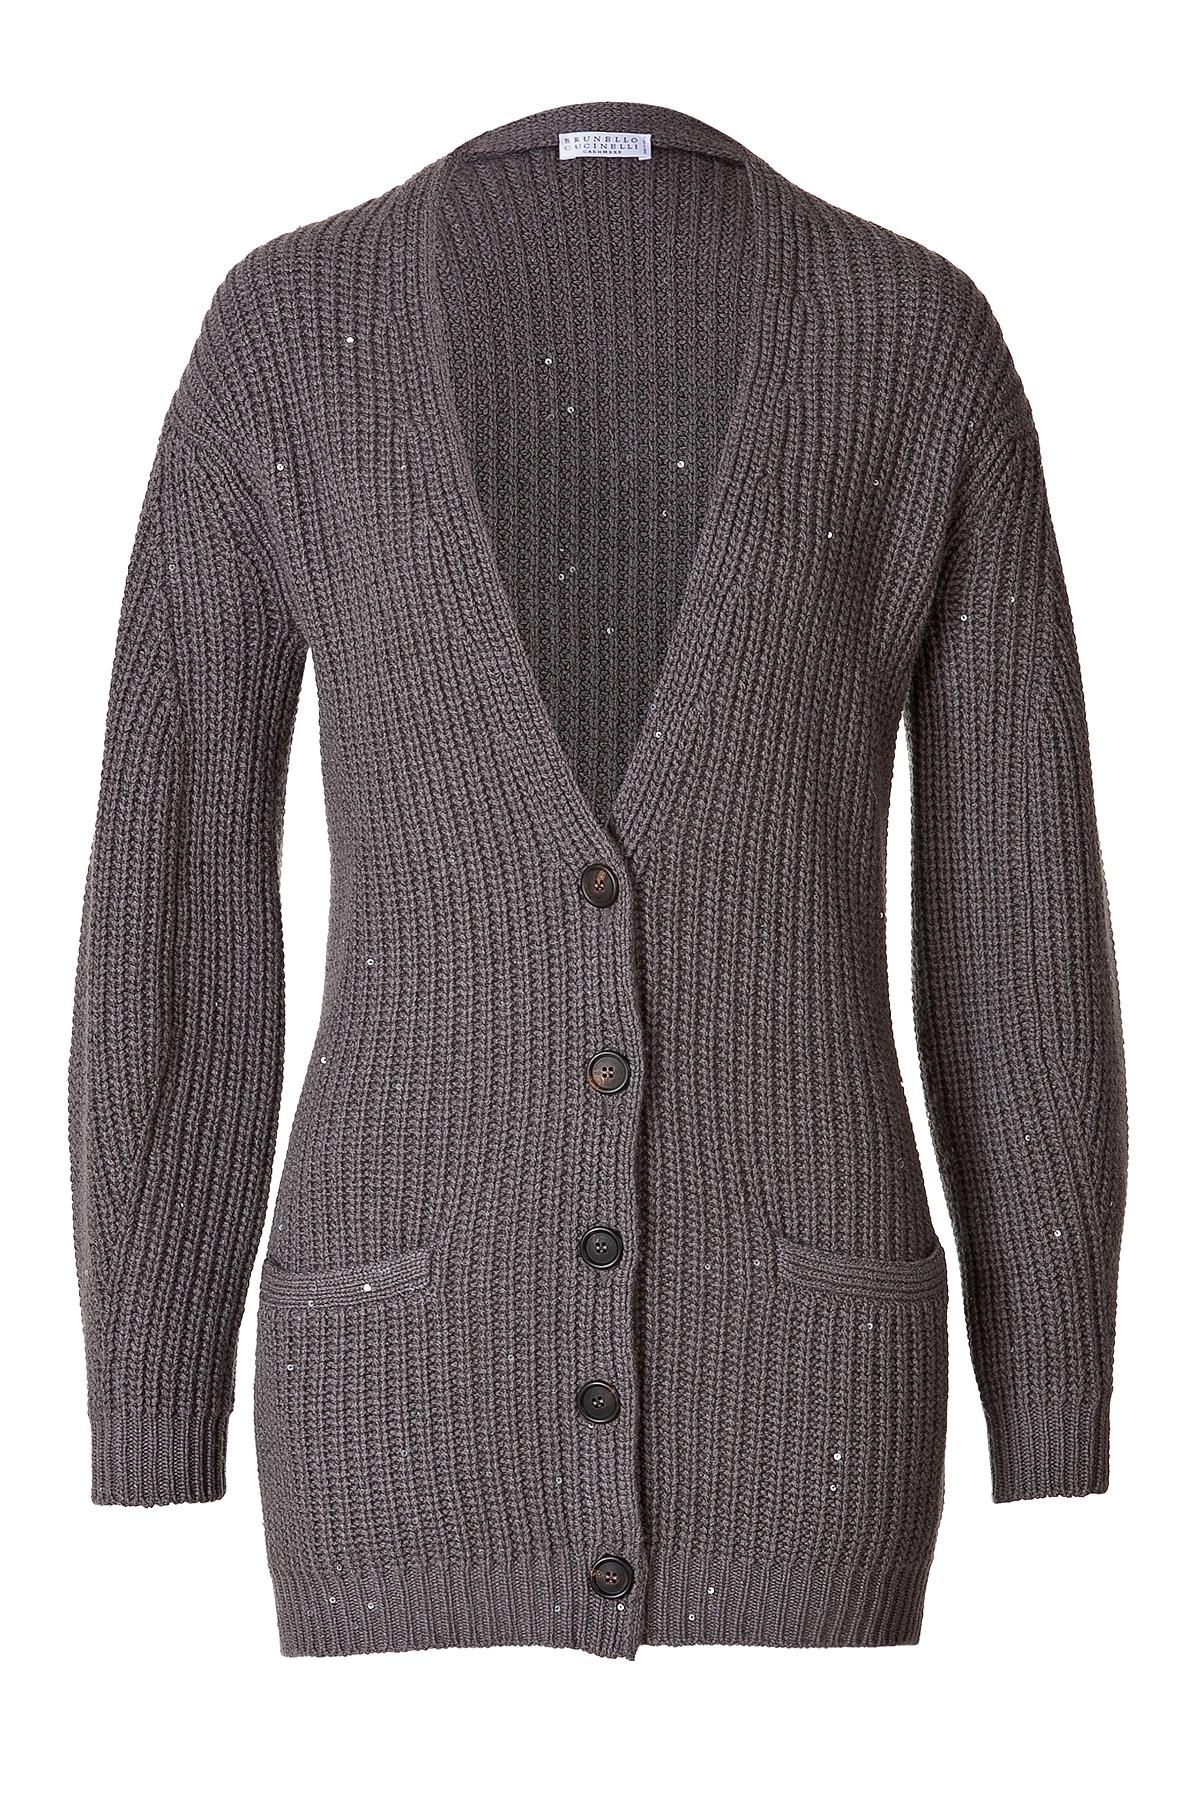 Brunello cucinelli Cashmere-silk Sequin Embellished Cardigan ...